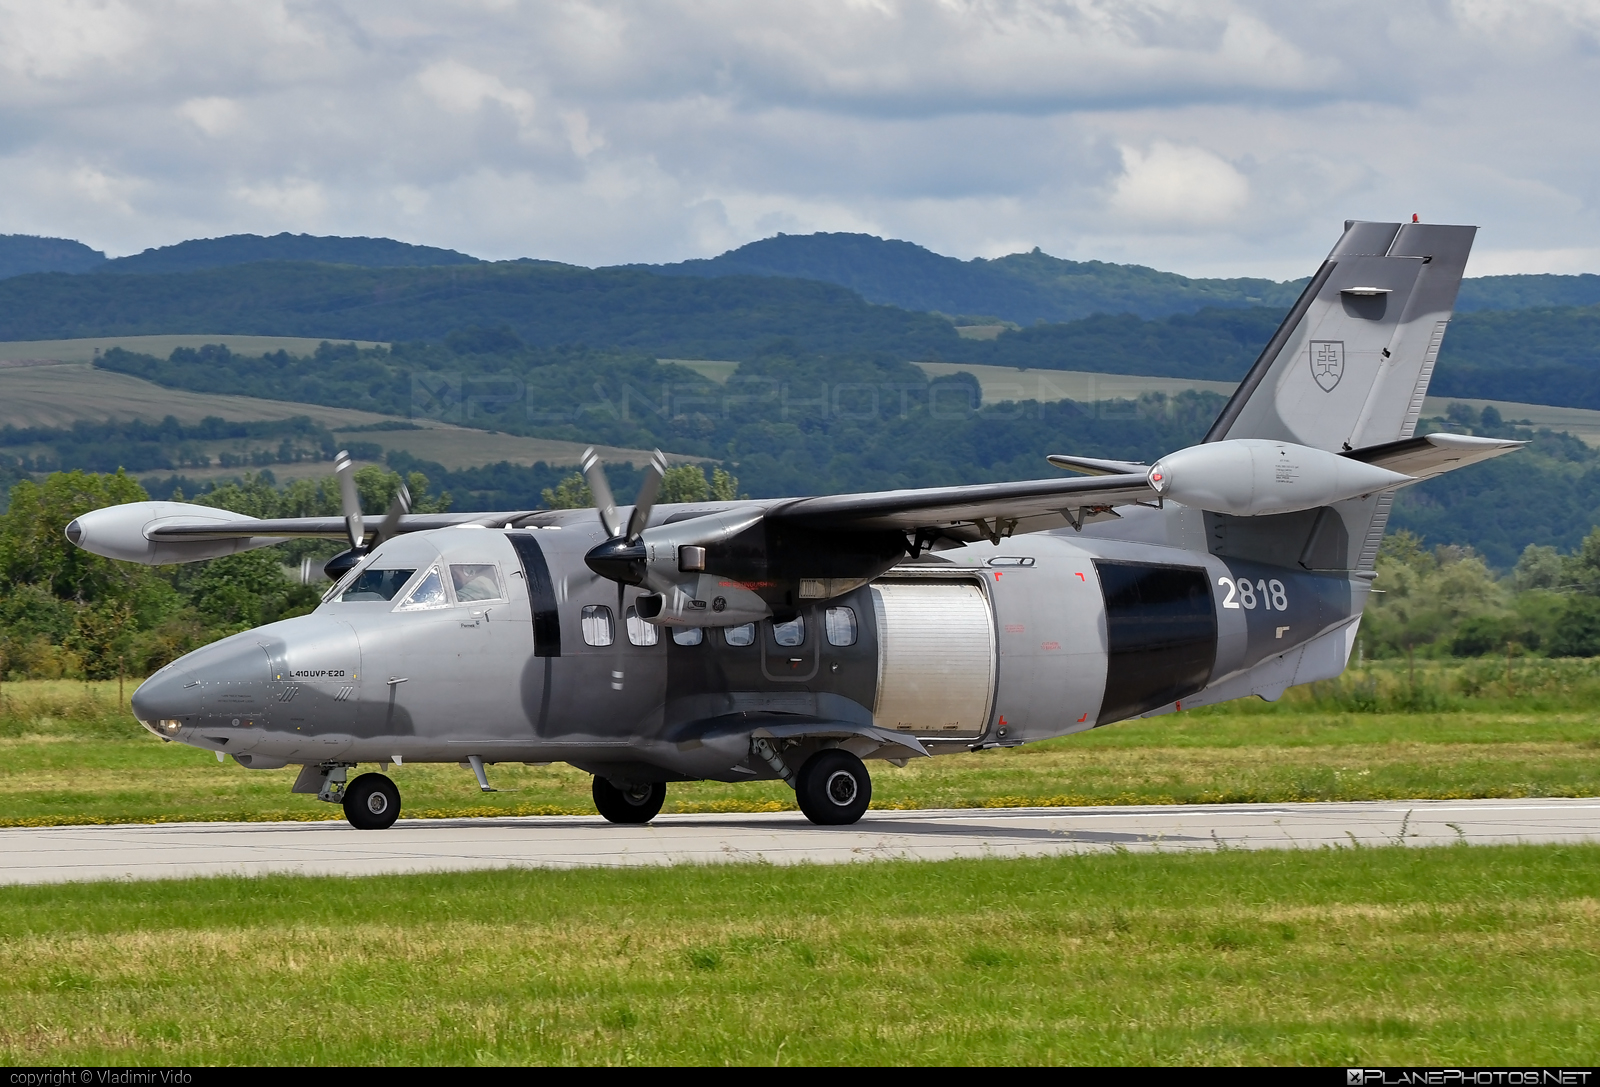 Let L-410UVP-E20 Turbolet - 2818 operated by Vzdušné sily OS SR (Slovak Air Force) #let #slovakairforce #vzdusnesilyossr